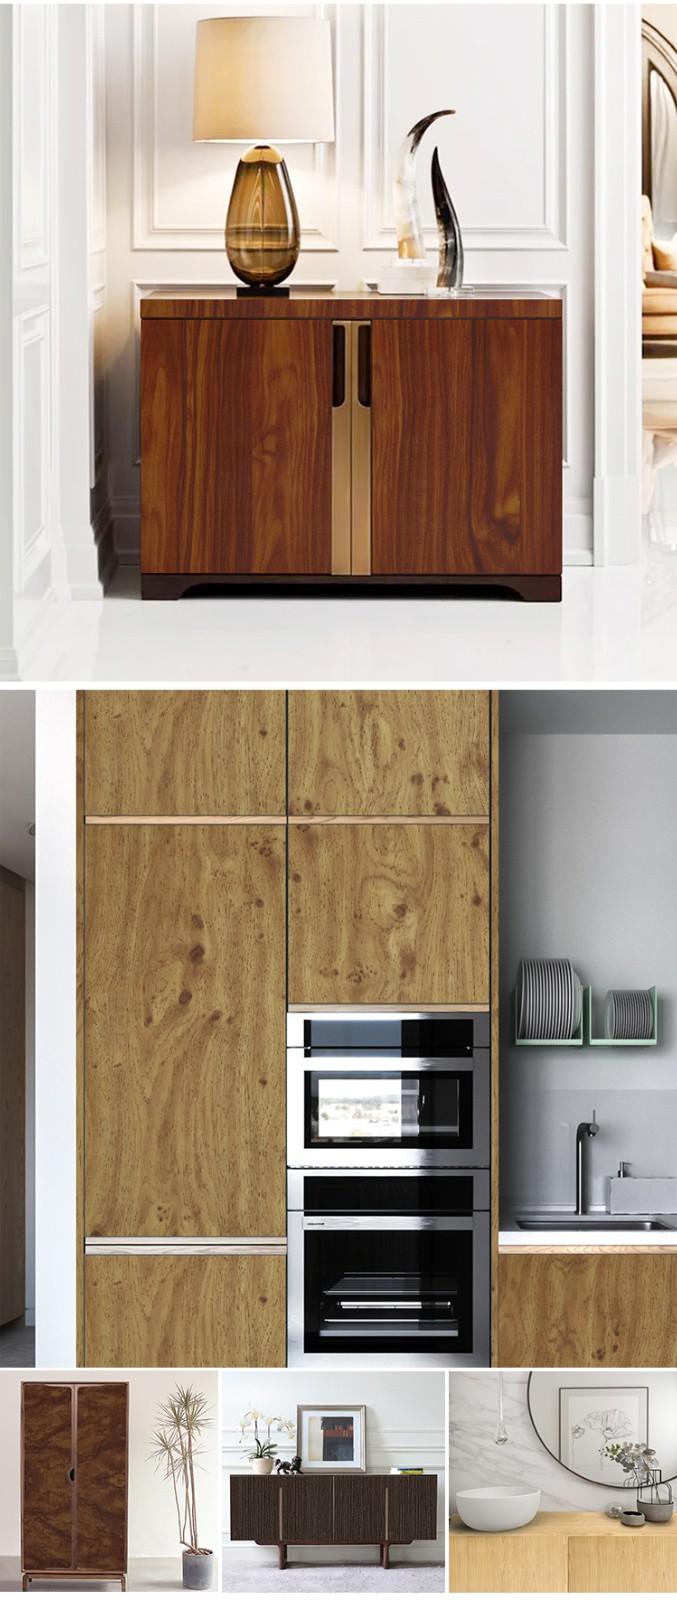 SUNYE wood grain paper roll company for electrical room-5